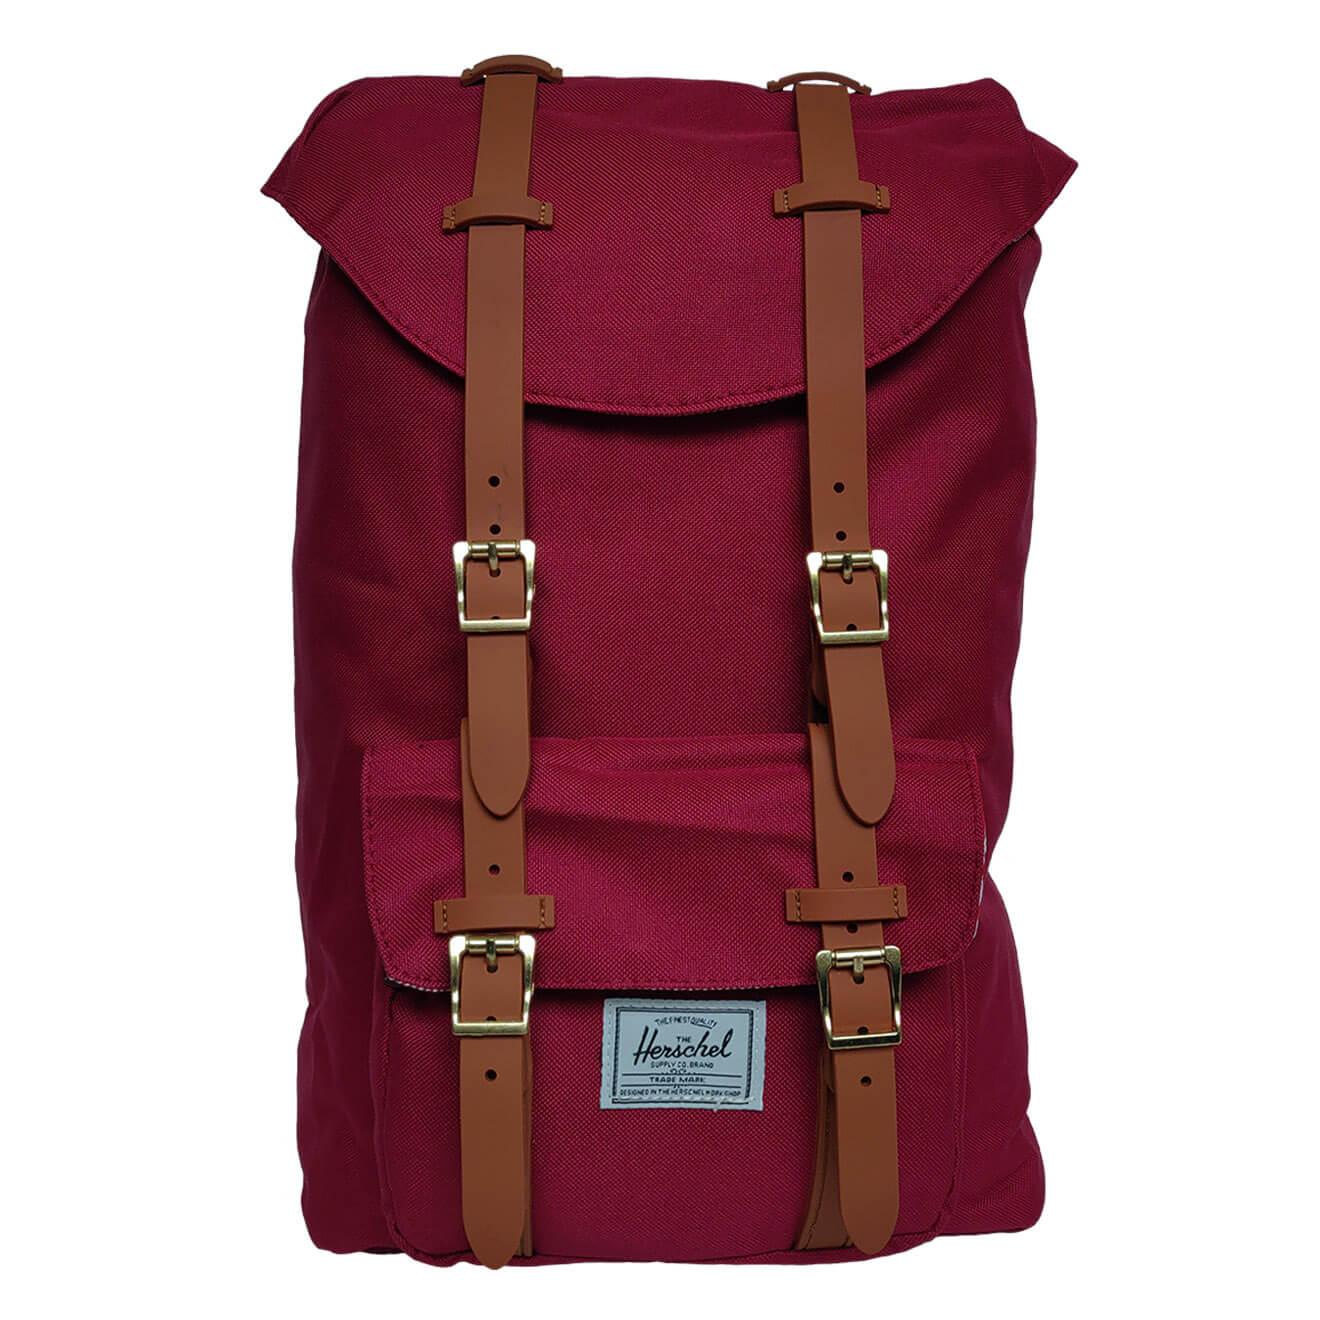 ad0d8bb8048 Herschel Little America Windsor Wine   Tan - Retro Bags